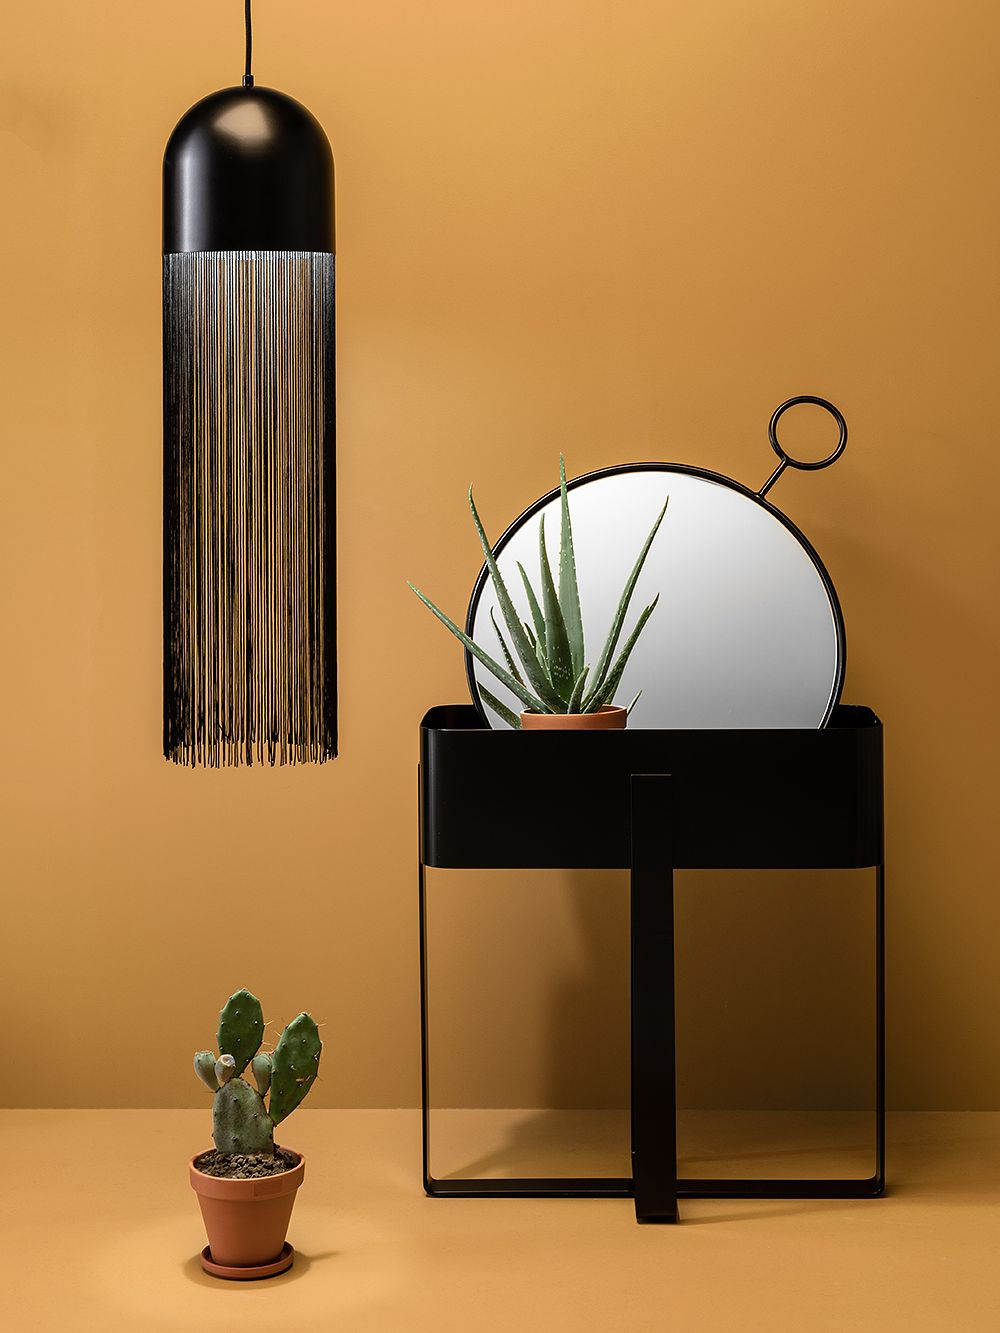 Hide lamp by Laura Väre